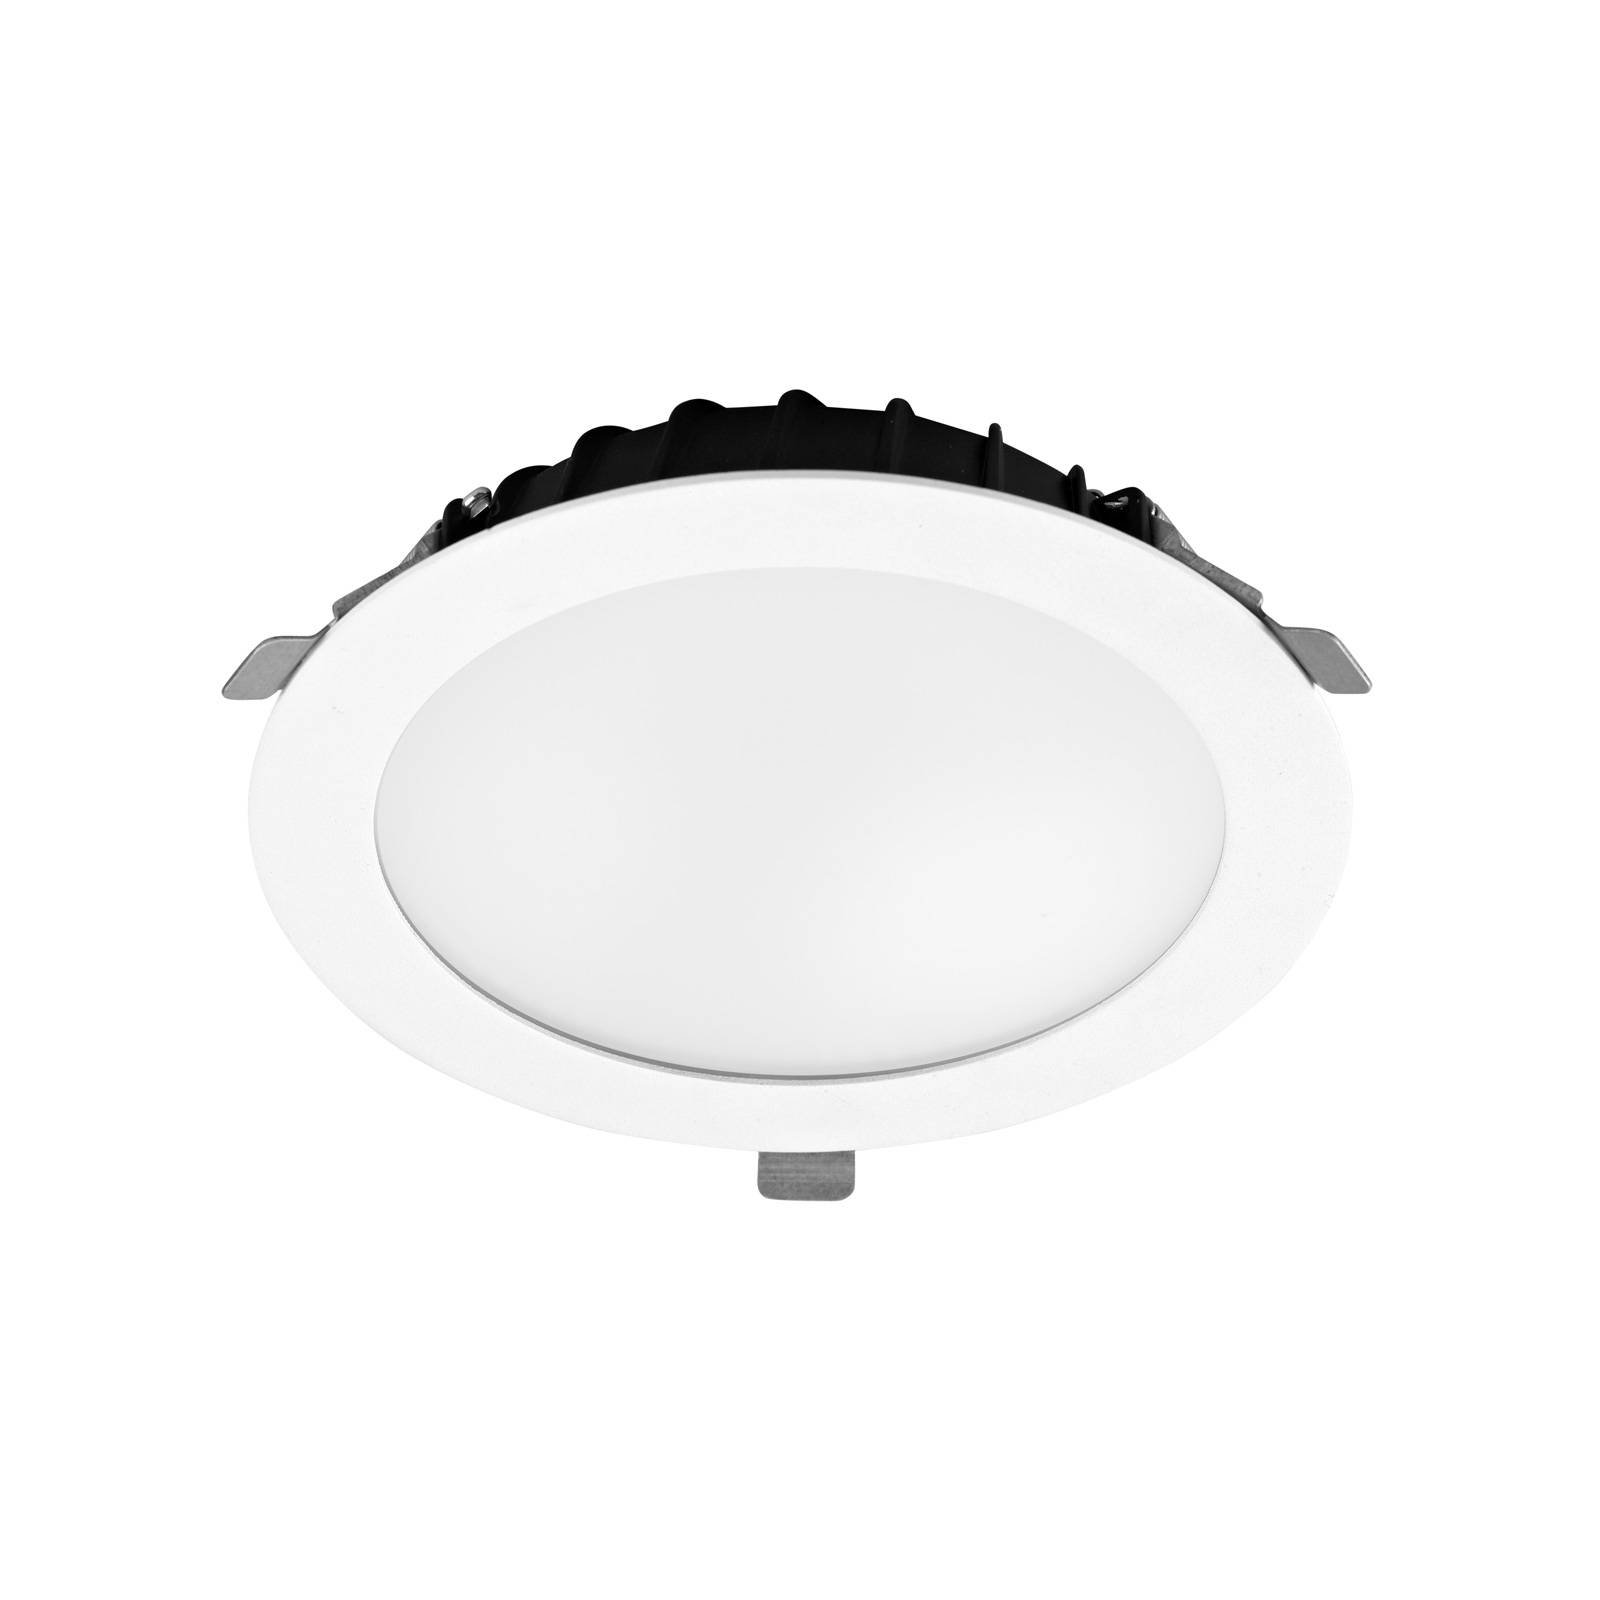 LEDS-C4 Vol downlight Ø 13,4 cm 4 000 K